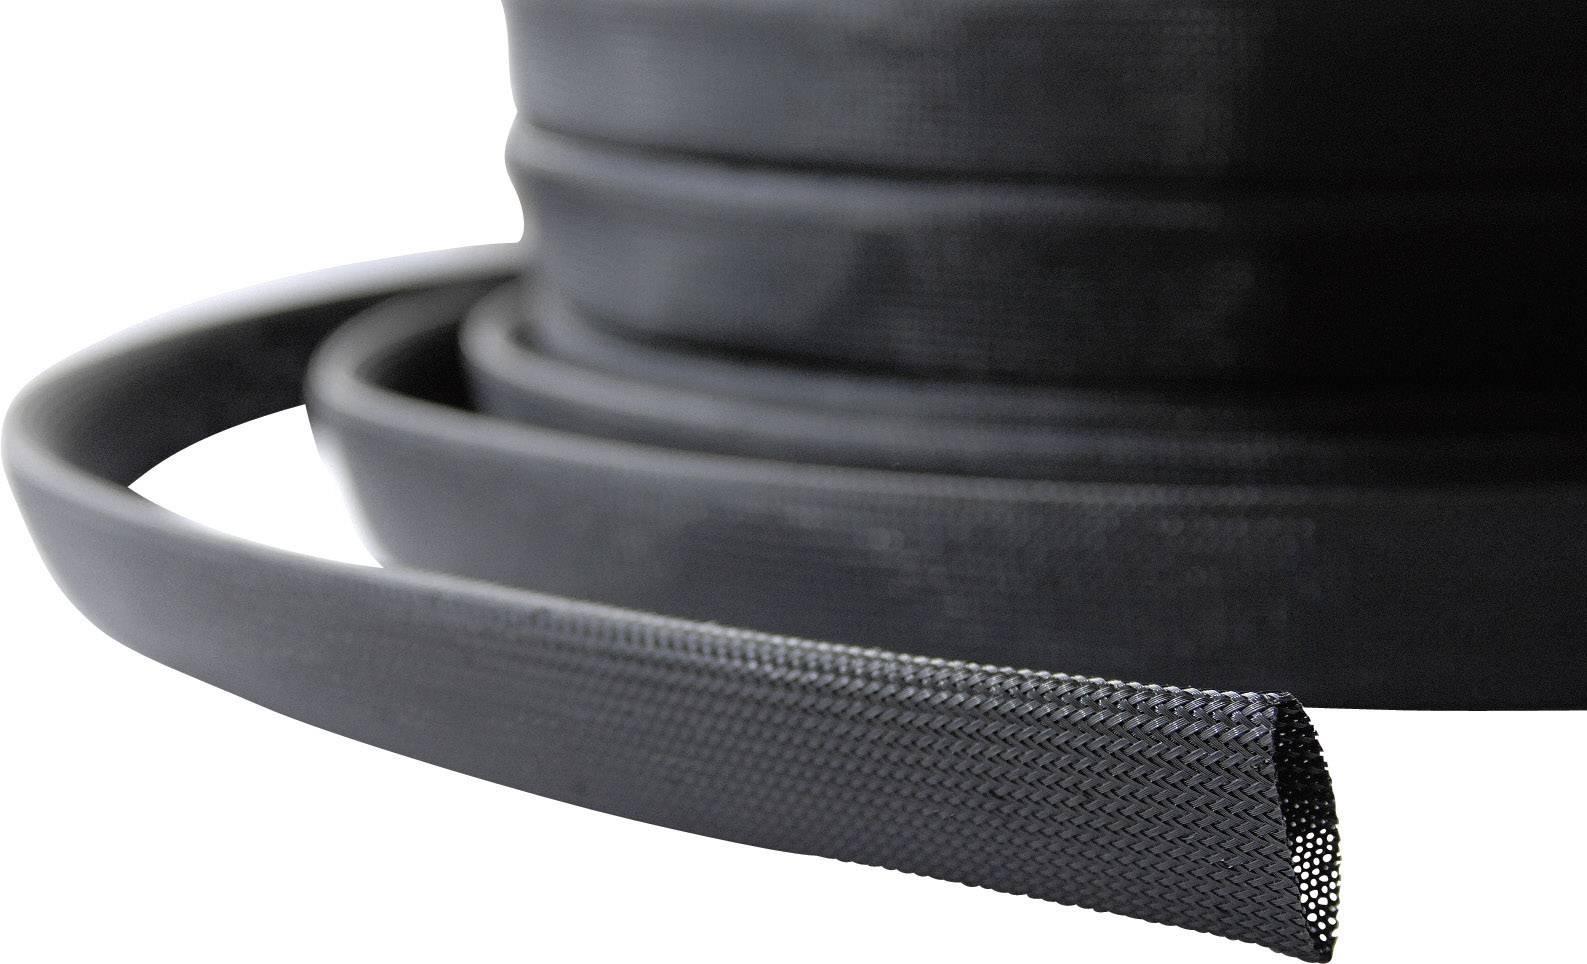 Ochranný oplet LappKabel SILVYN® BRAID PA6 NW, 4 do 10 mm, -55 do +125 °C, 20 m, čierna